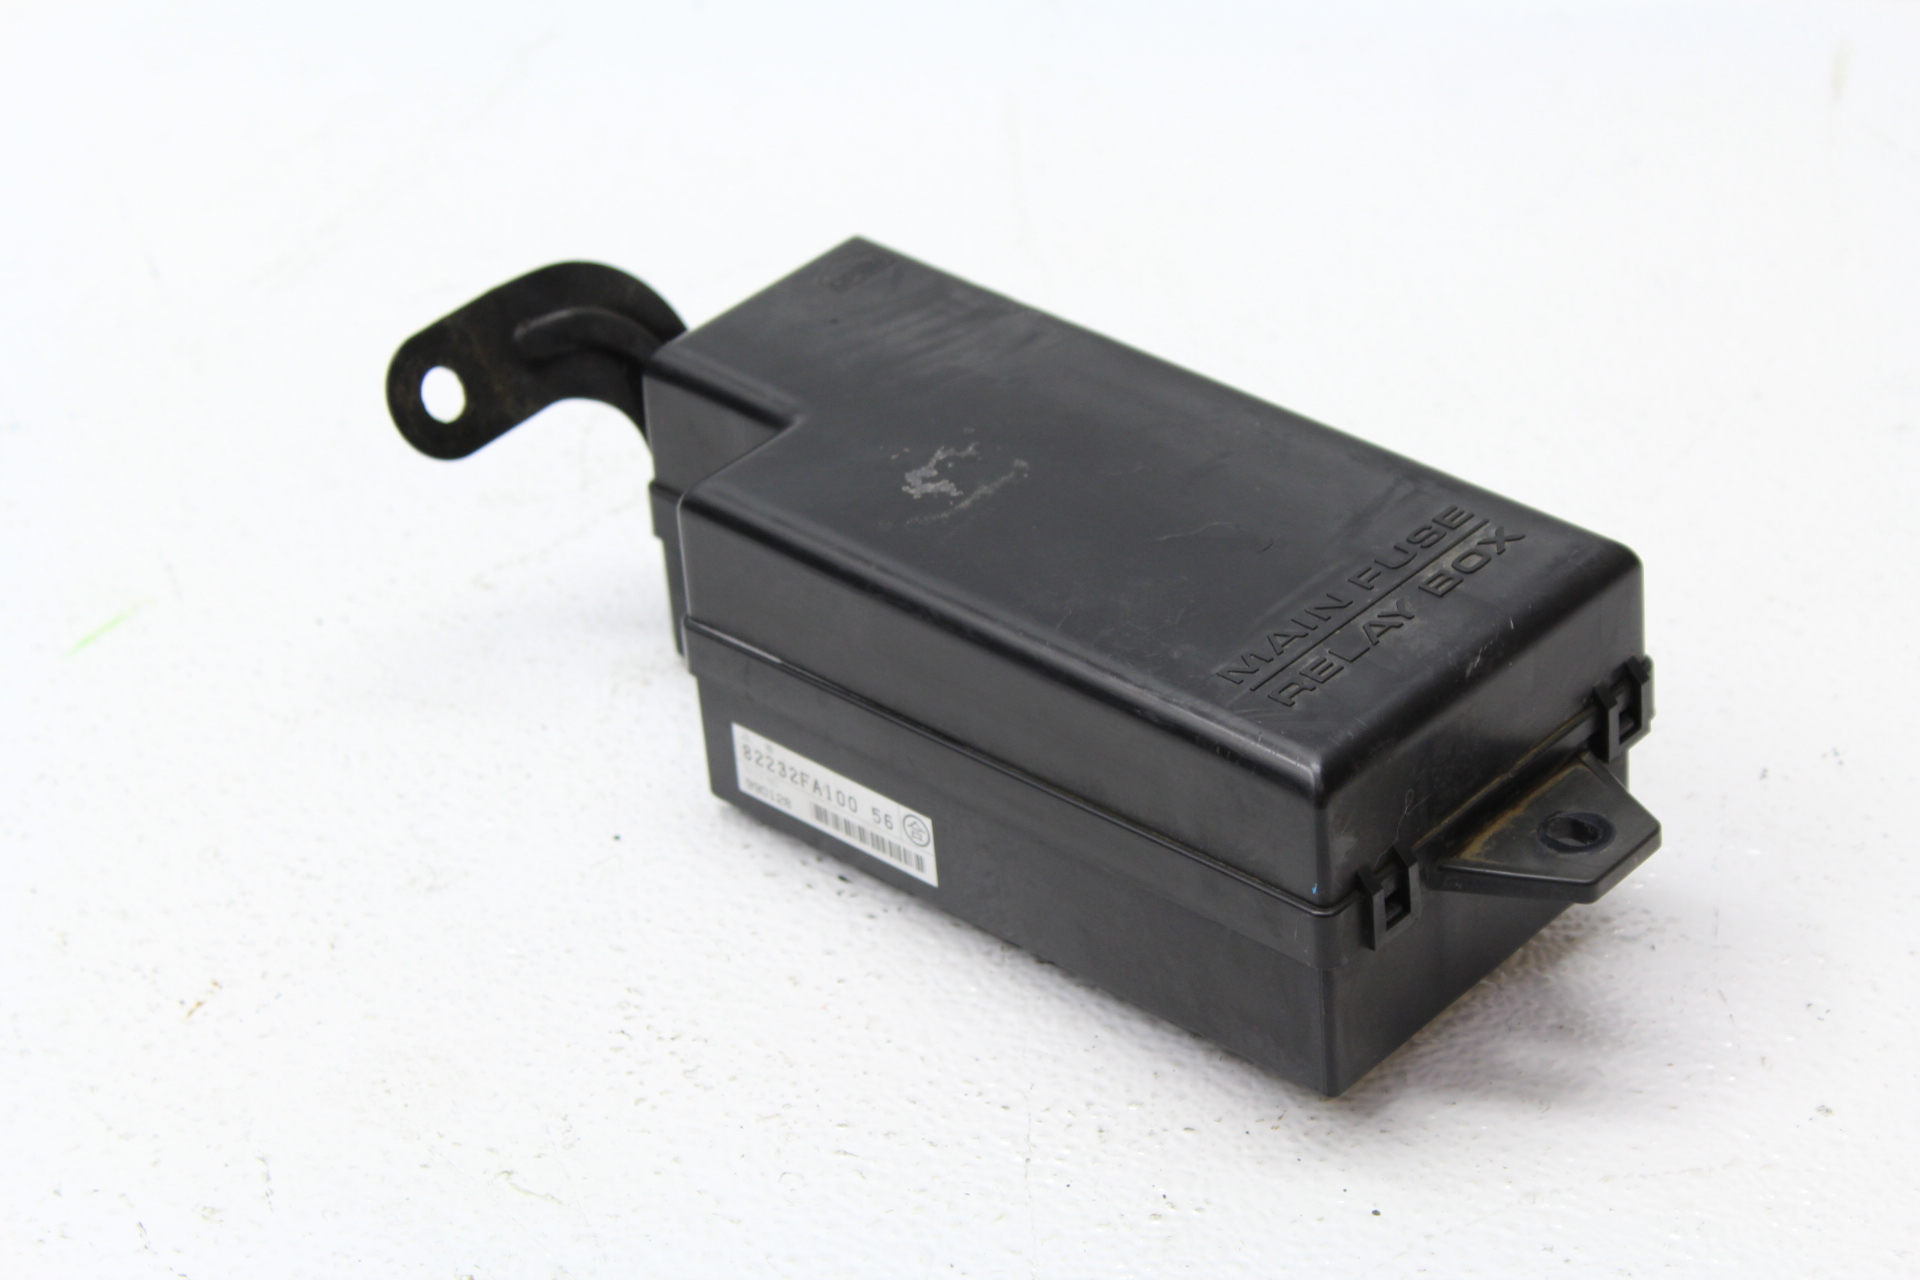 1998-2001 SUBARU IMPREZA 2.5 RS GC8 ENGINE BAY FUSE BOX OEM